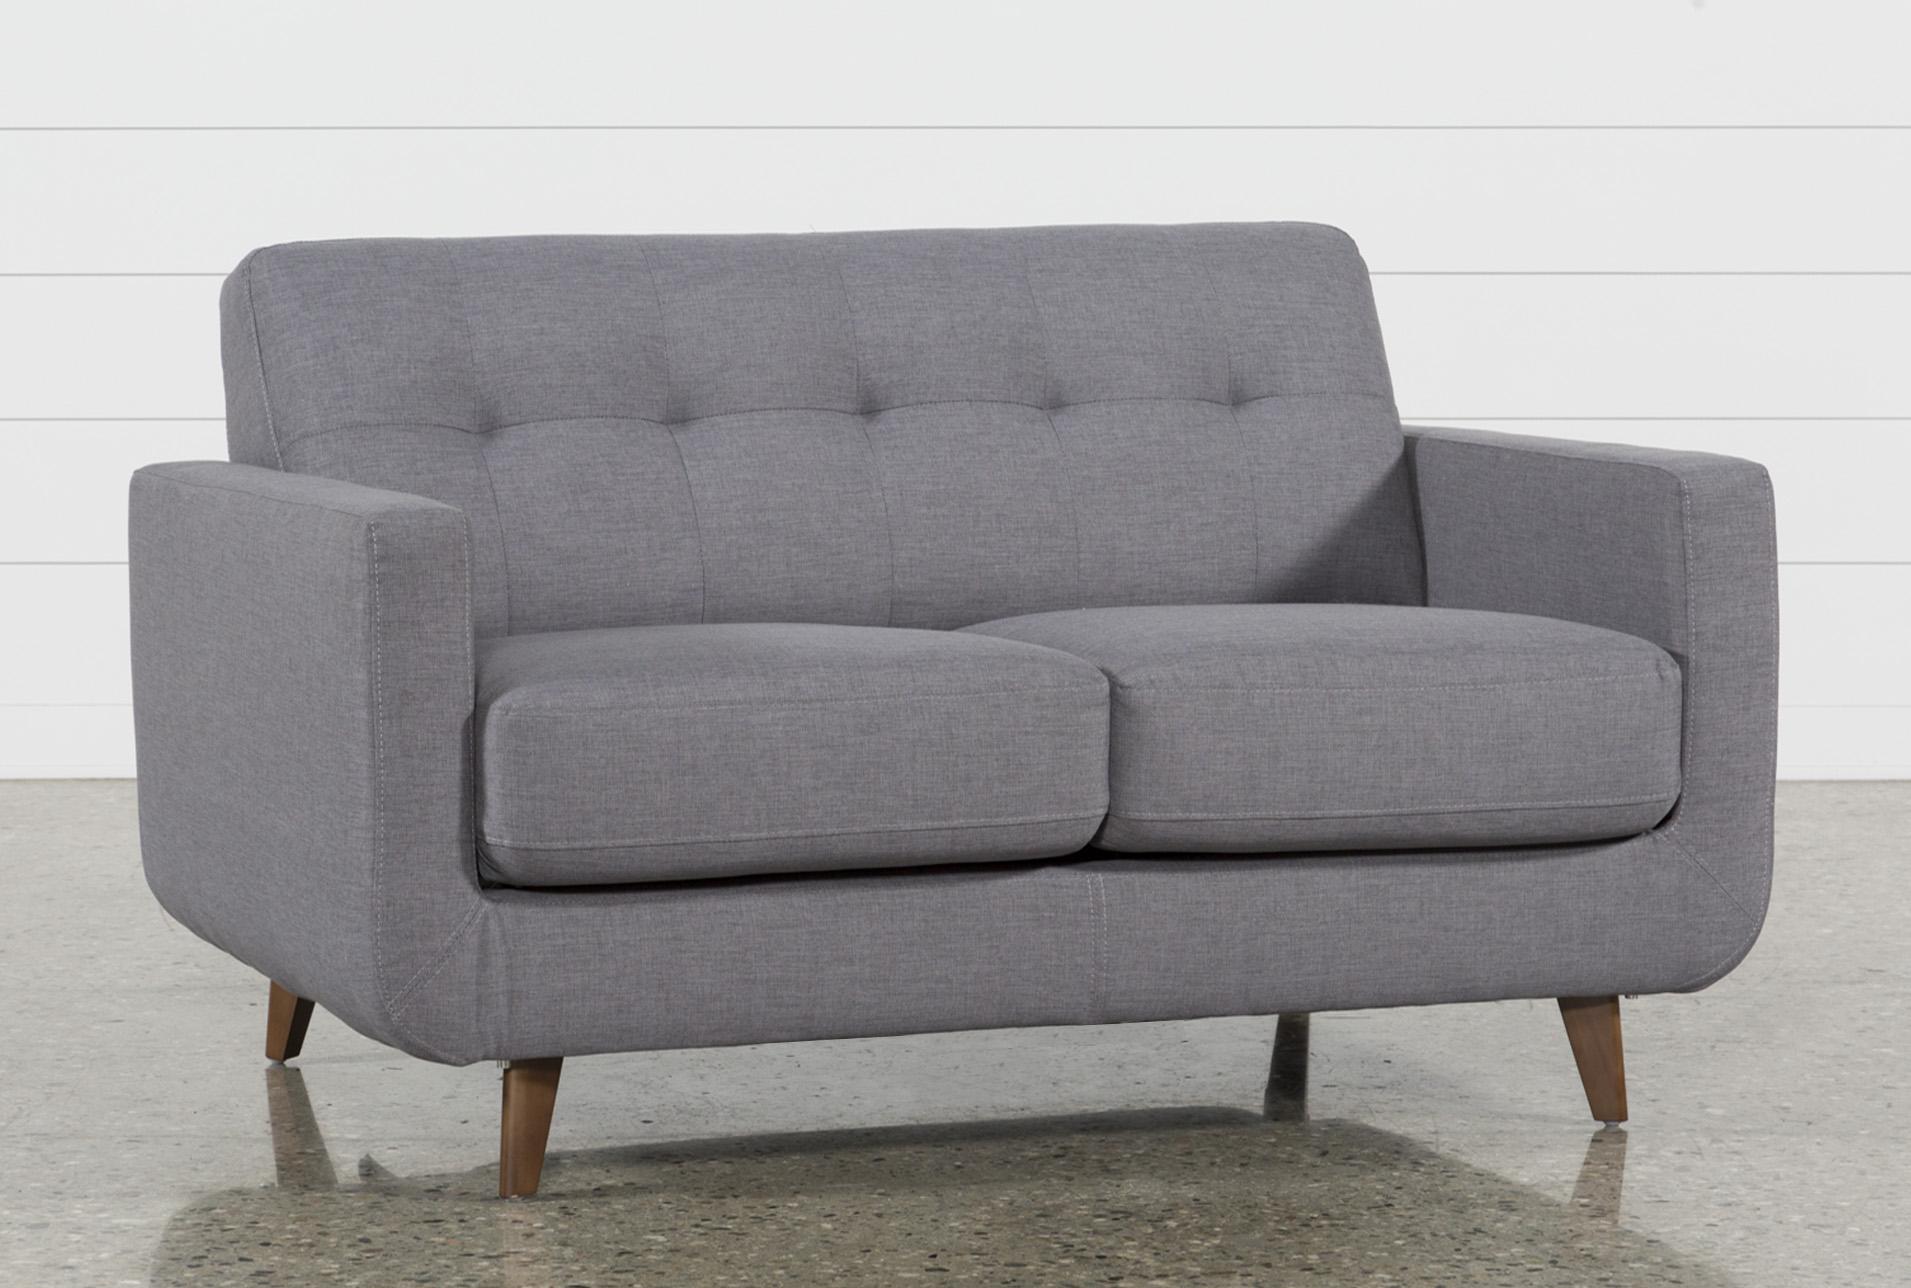 Loveseat Settee Mid Century W Wood Frame Gray Seat Finish Vintage Rustic Style